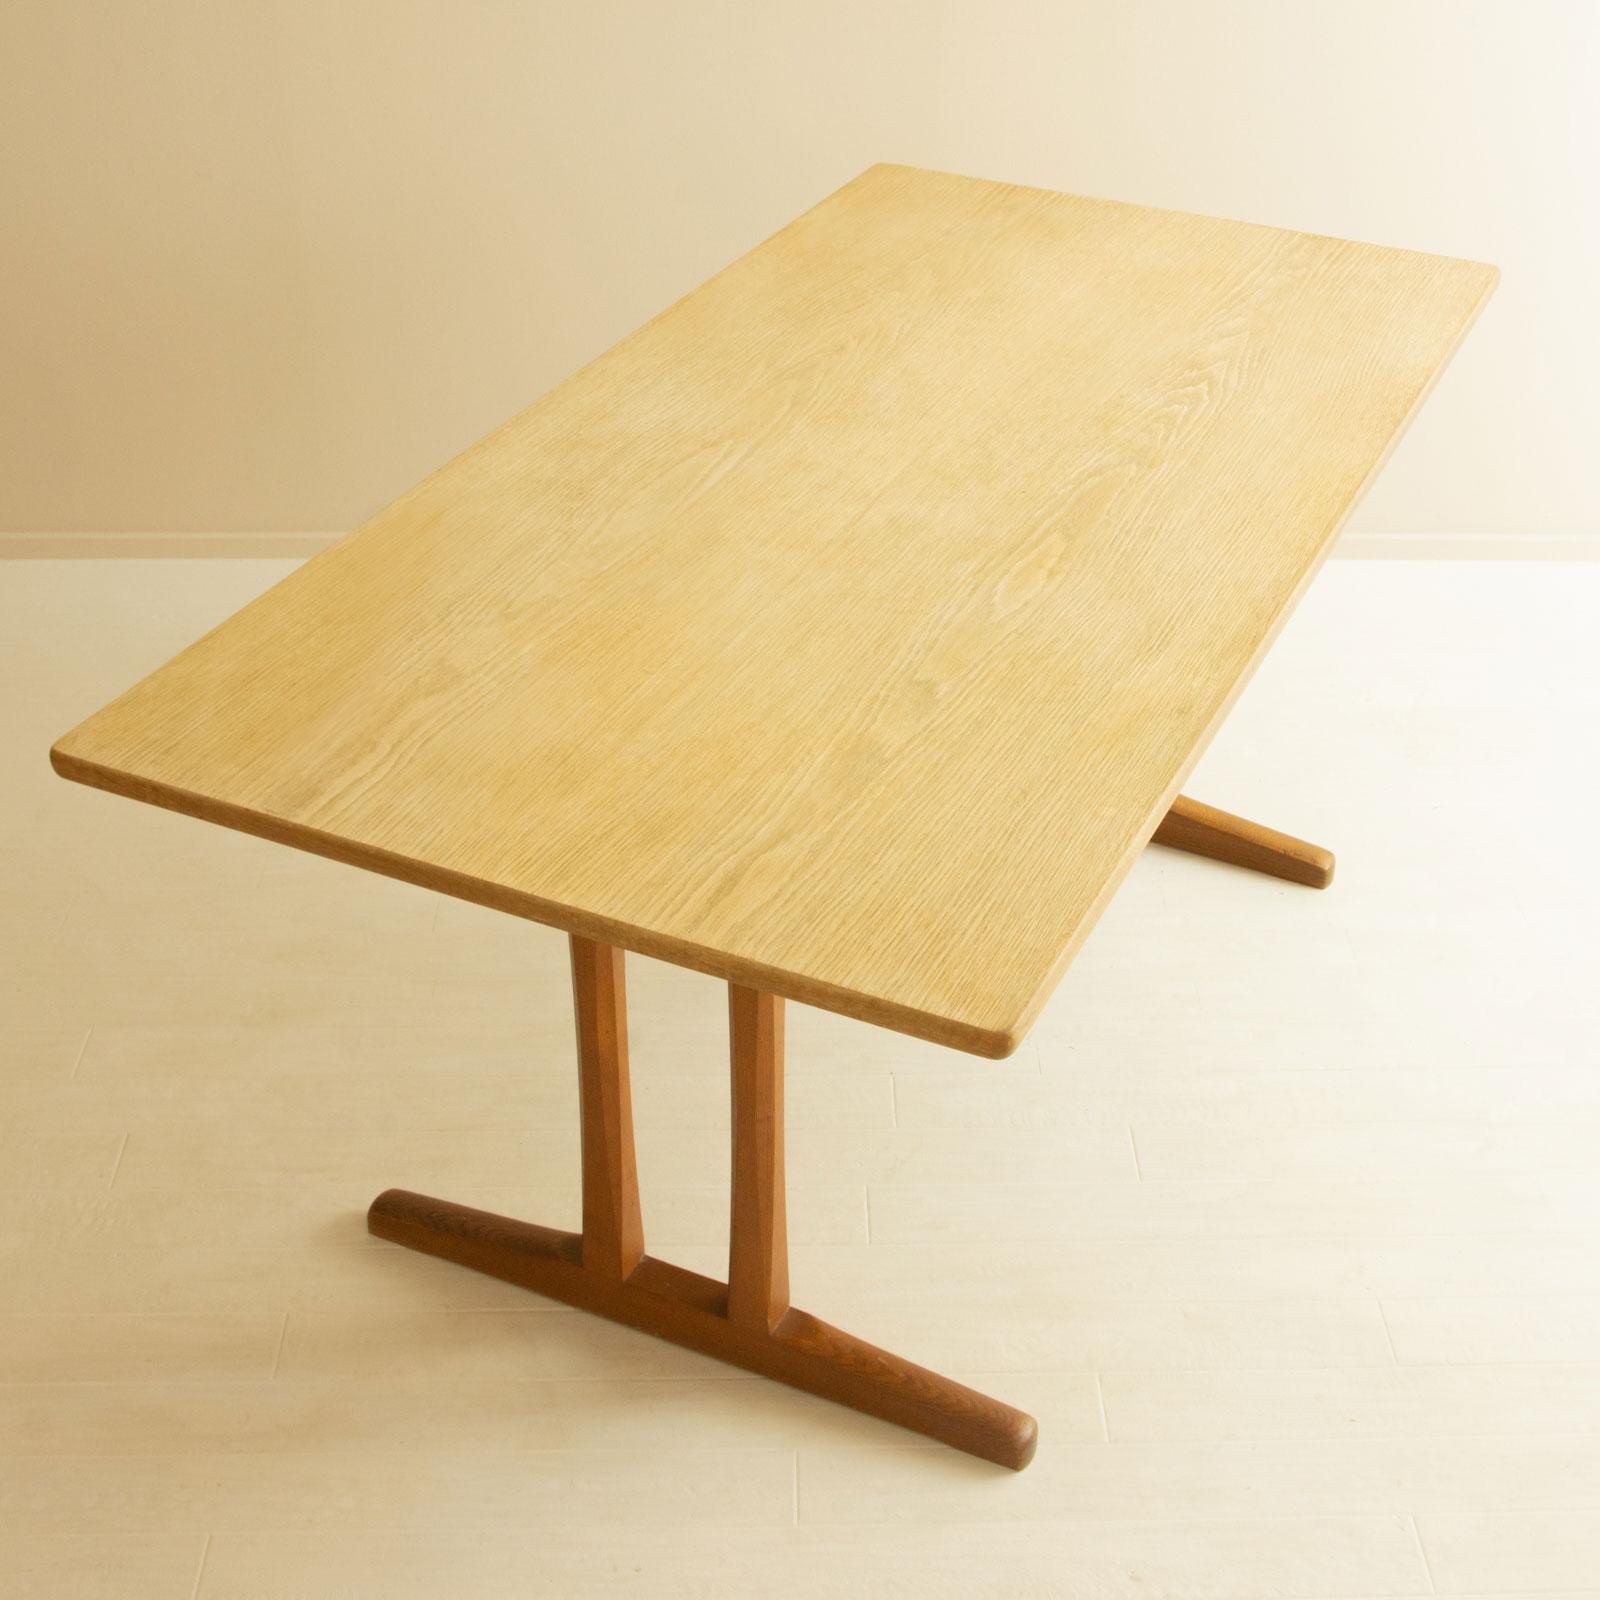 C18 Shaker Table by Borge Mogensen